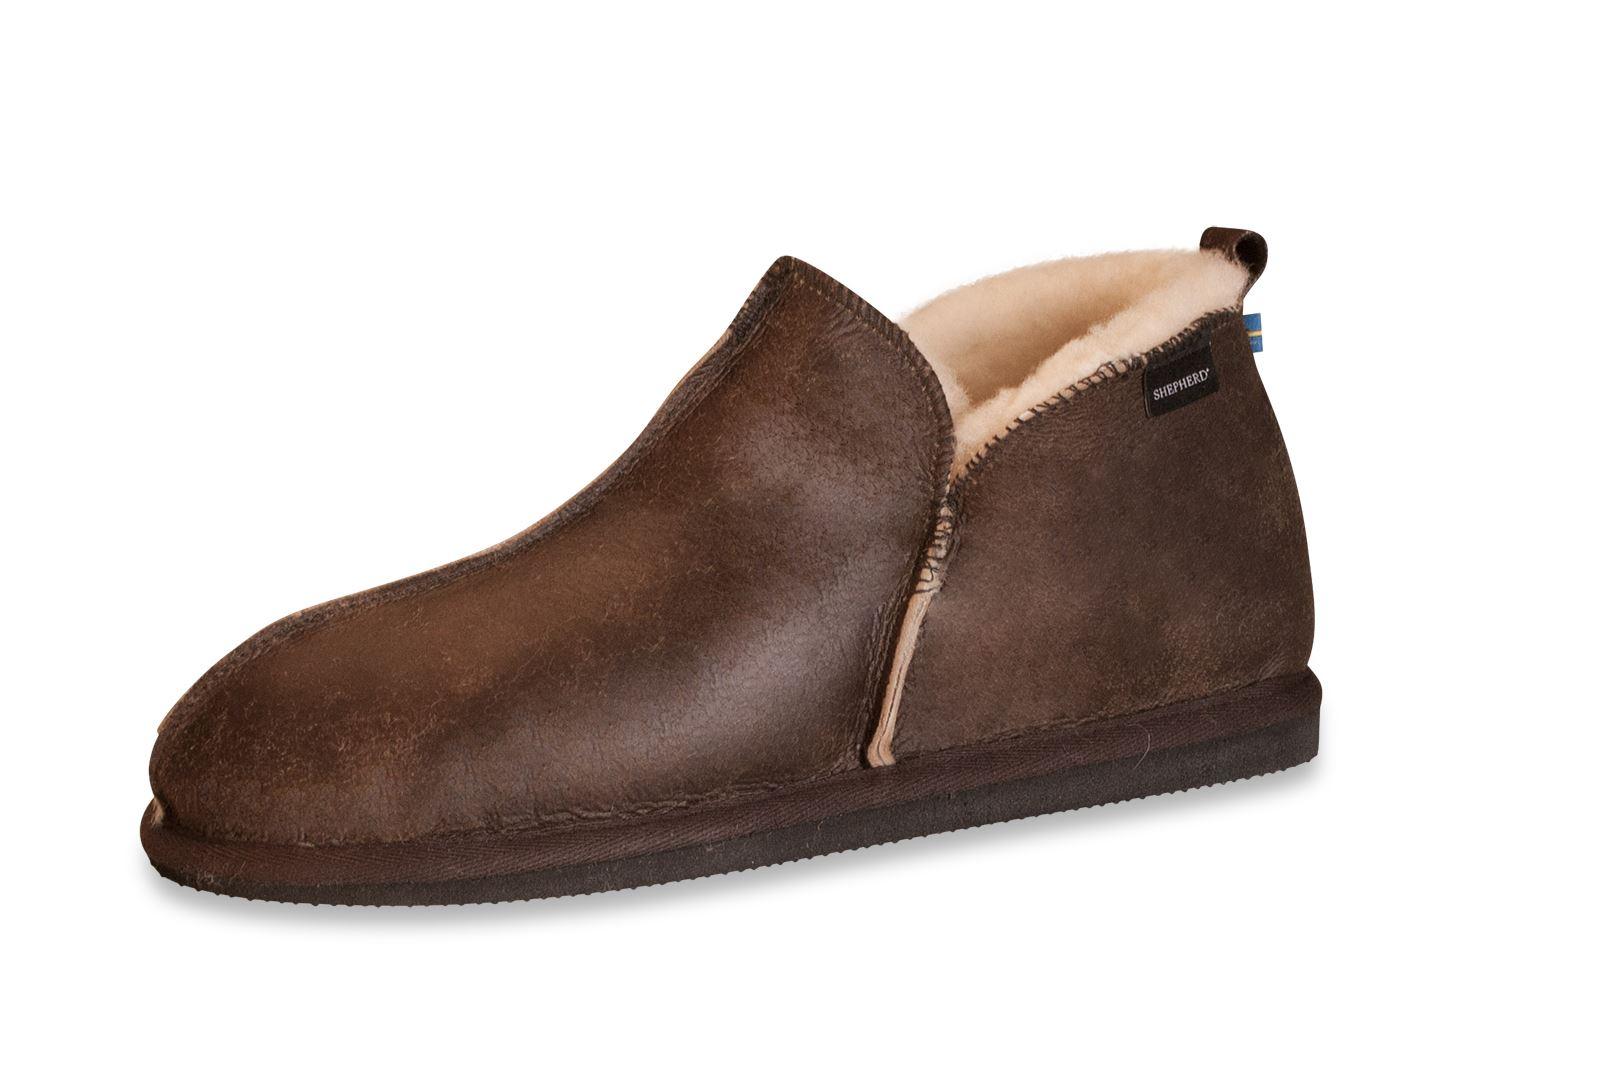 Shepherd Ladies Genuine Sheepskin Slippers Boots Hard Sole Womens ANNIE 4922